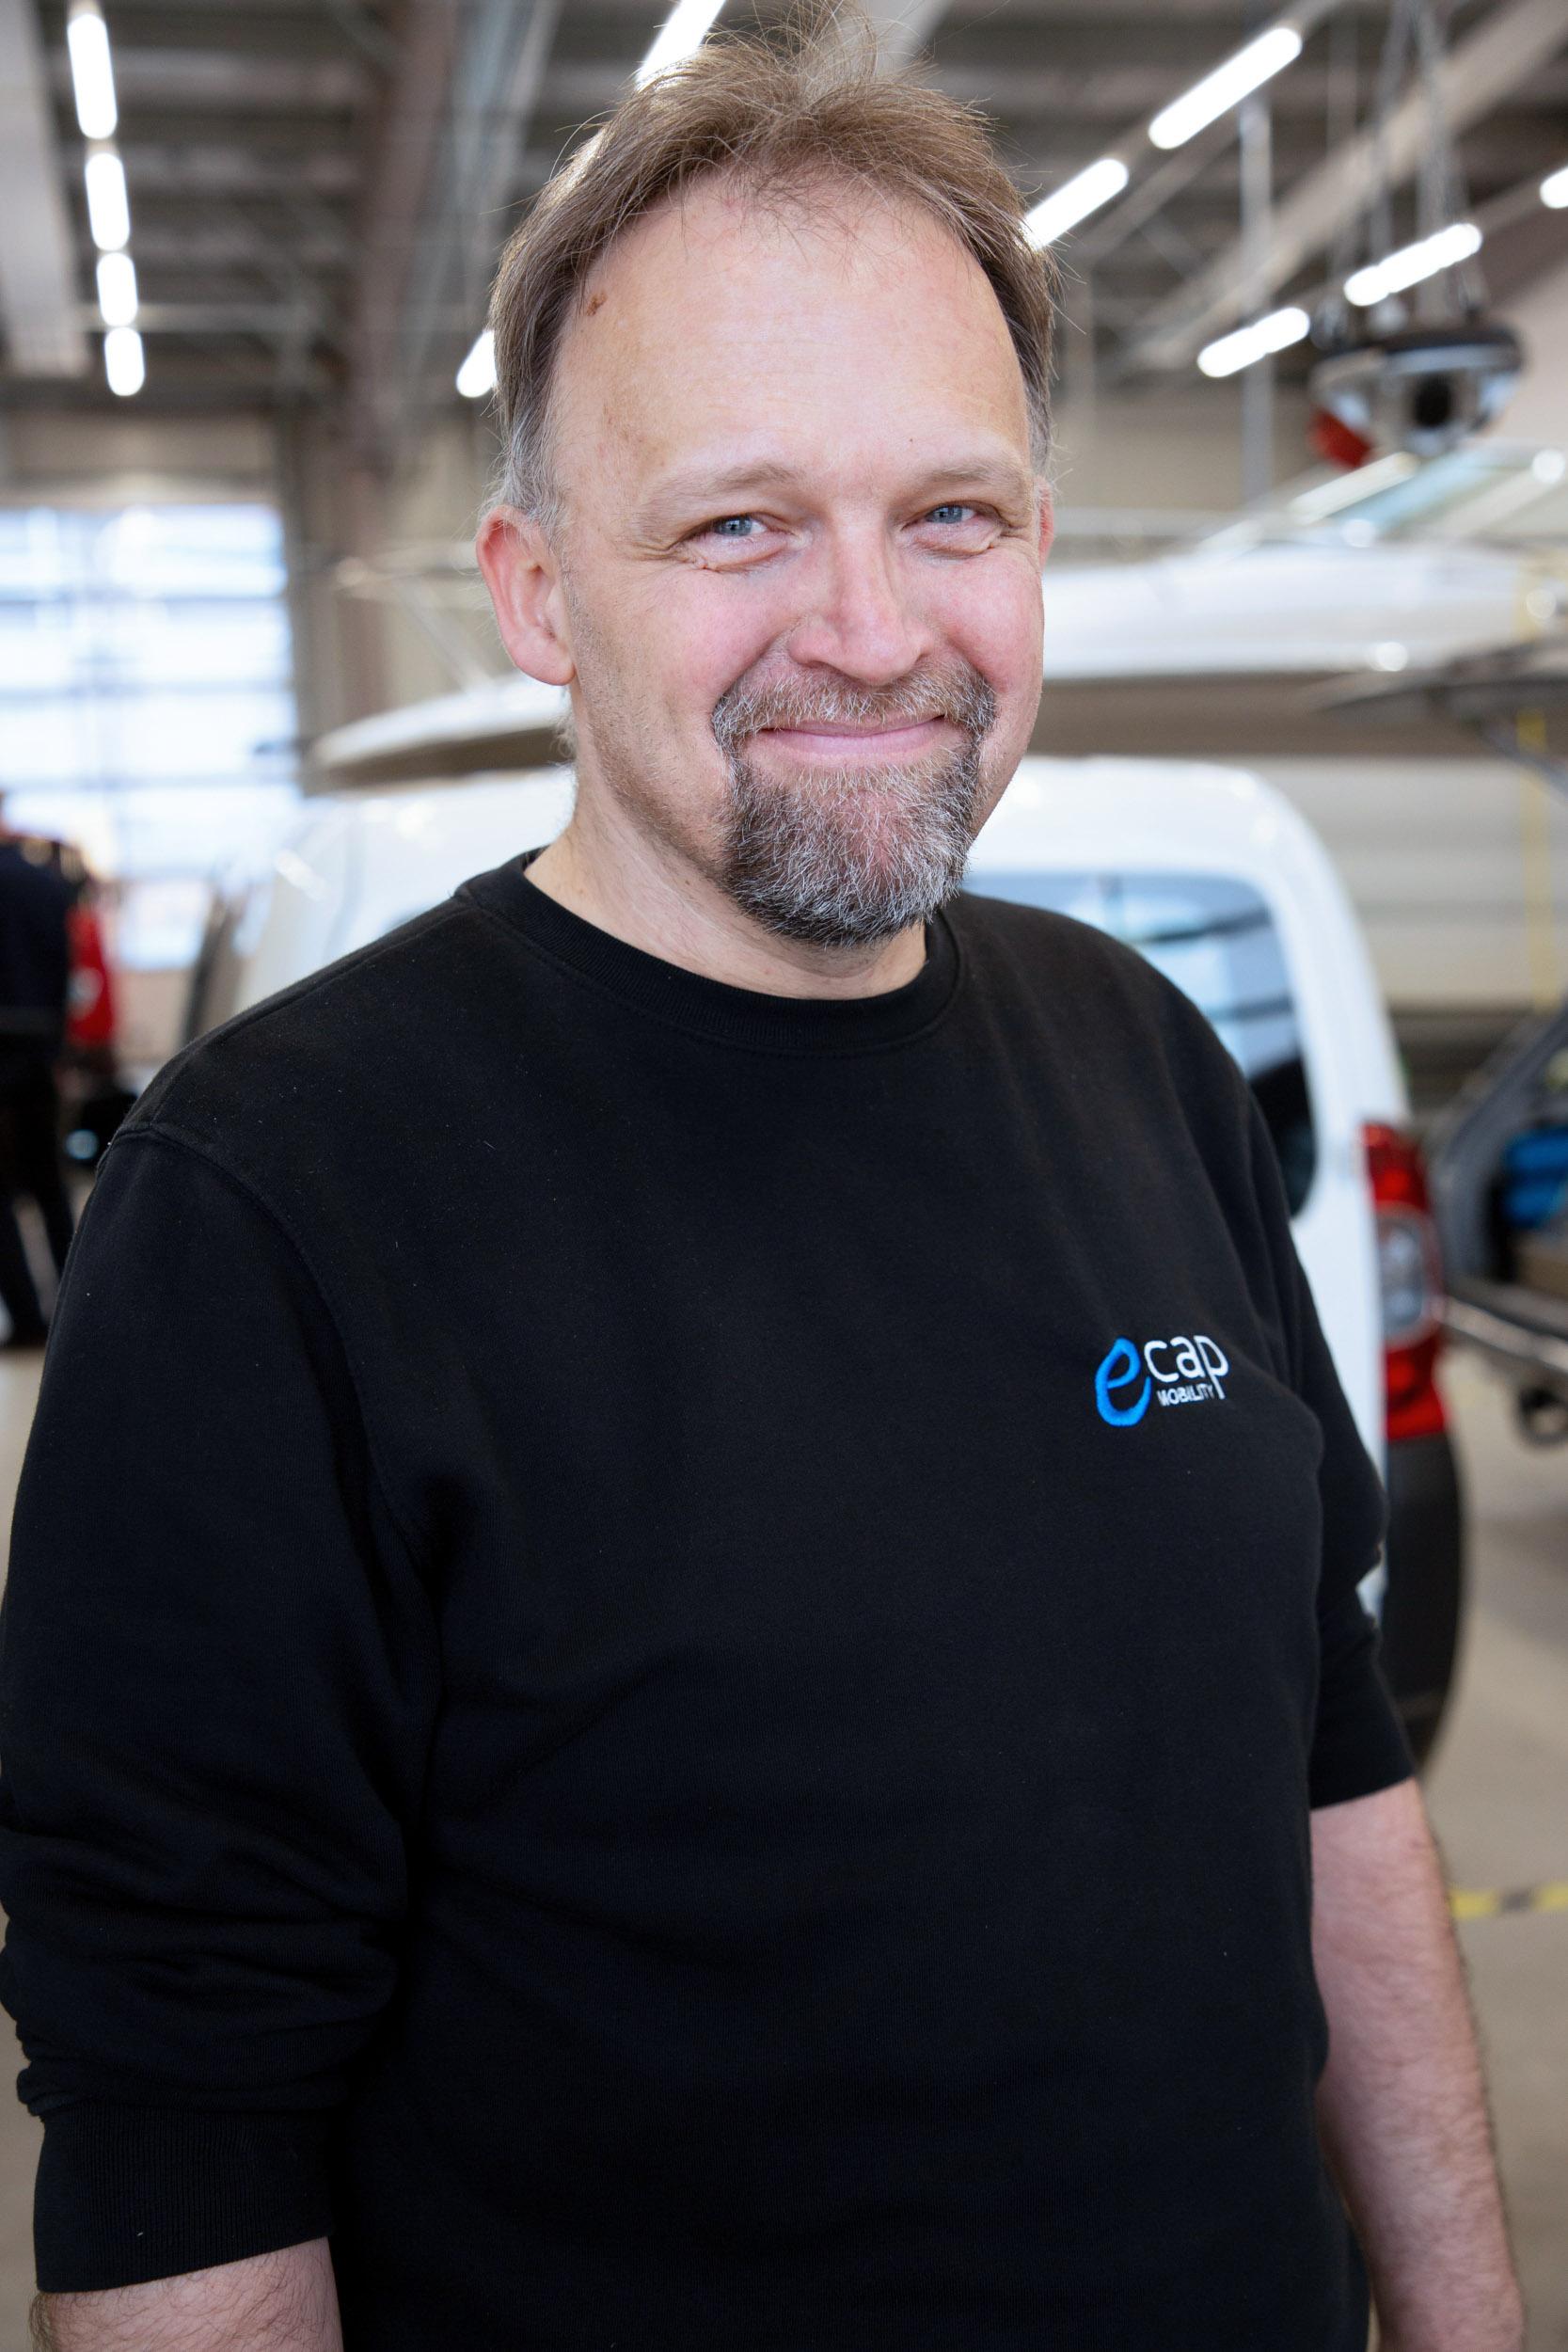 Bernd Goos | Werkstattleitung Nutzfahrzeuge / Industriemeister  bgo@ecap-mobility.com